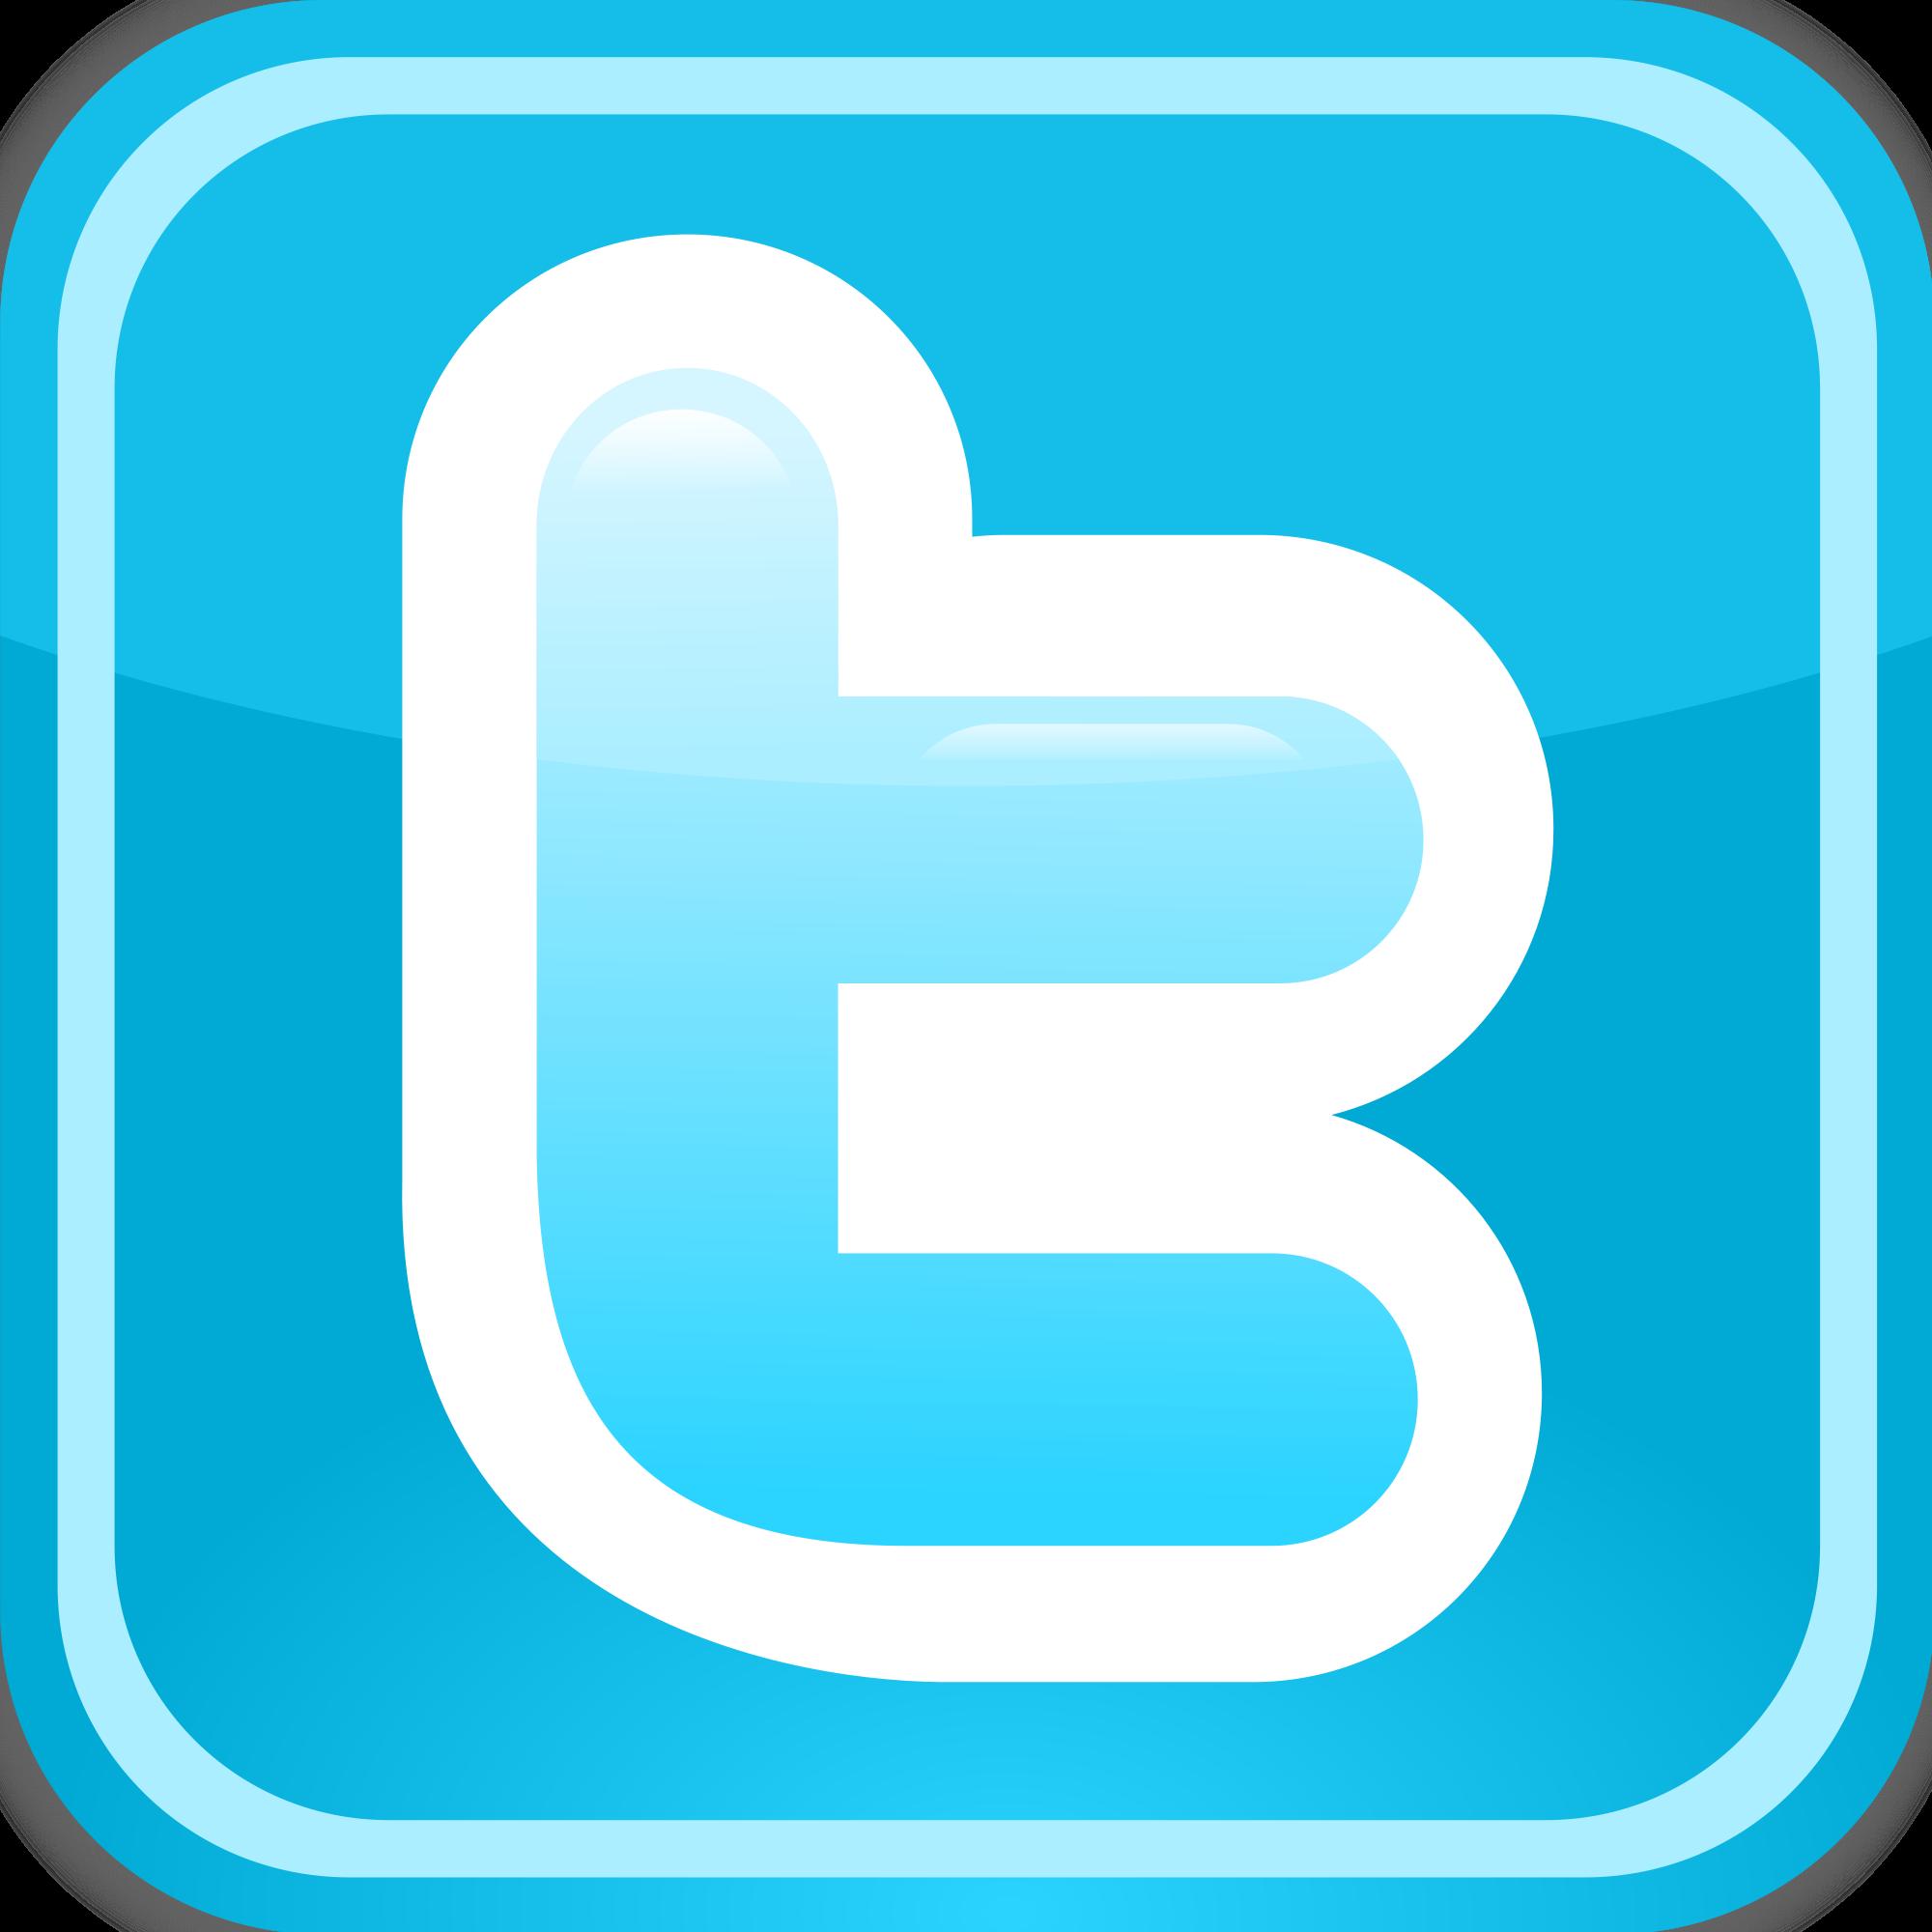 Free Twitter Logo